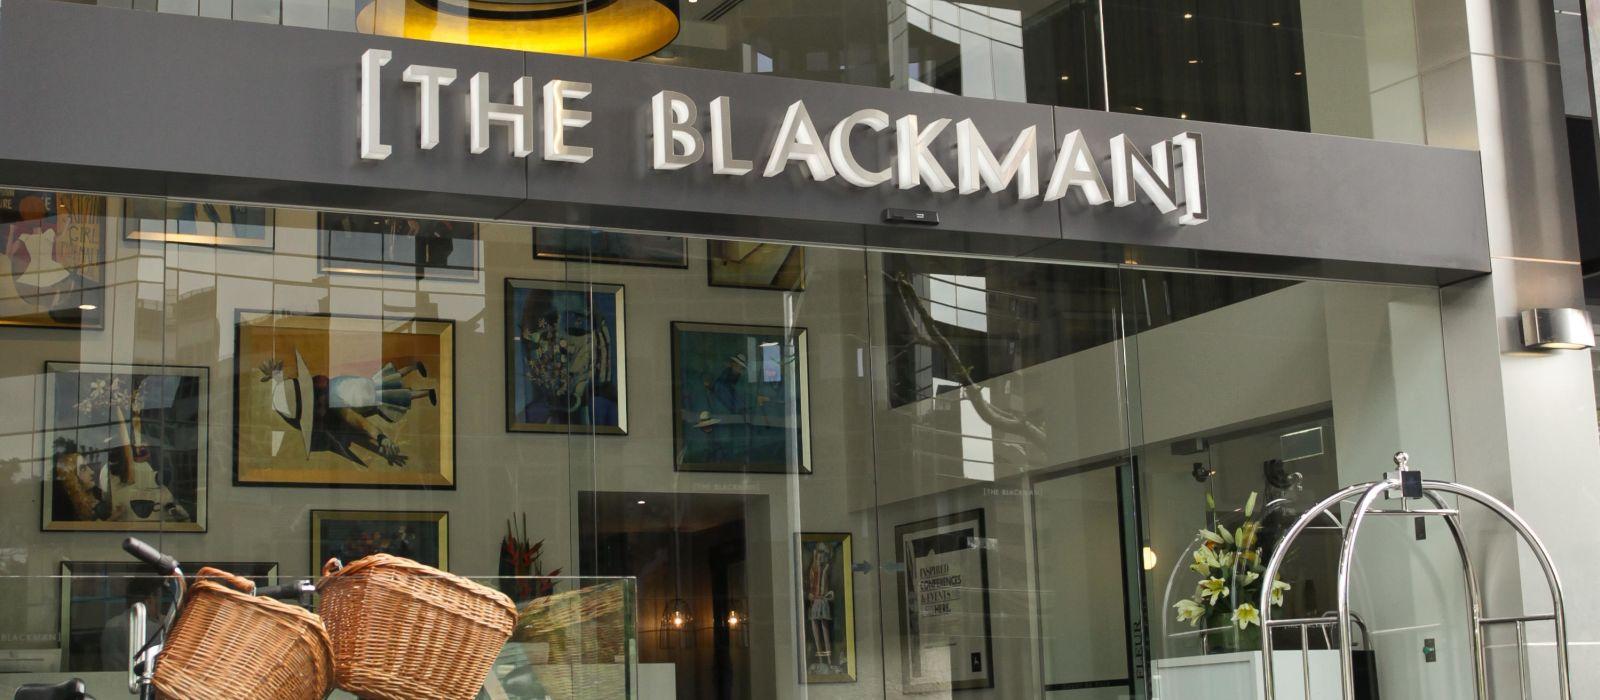 Hotel The Blackman  Australien